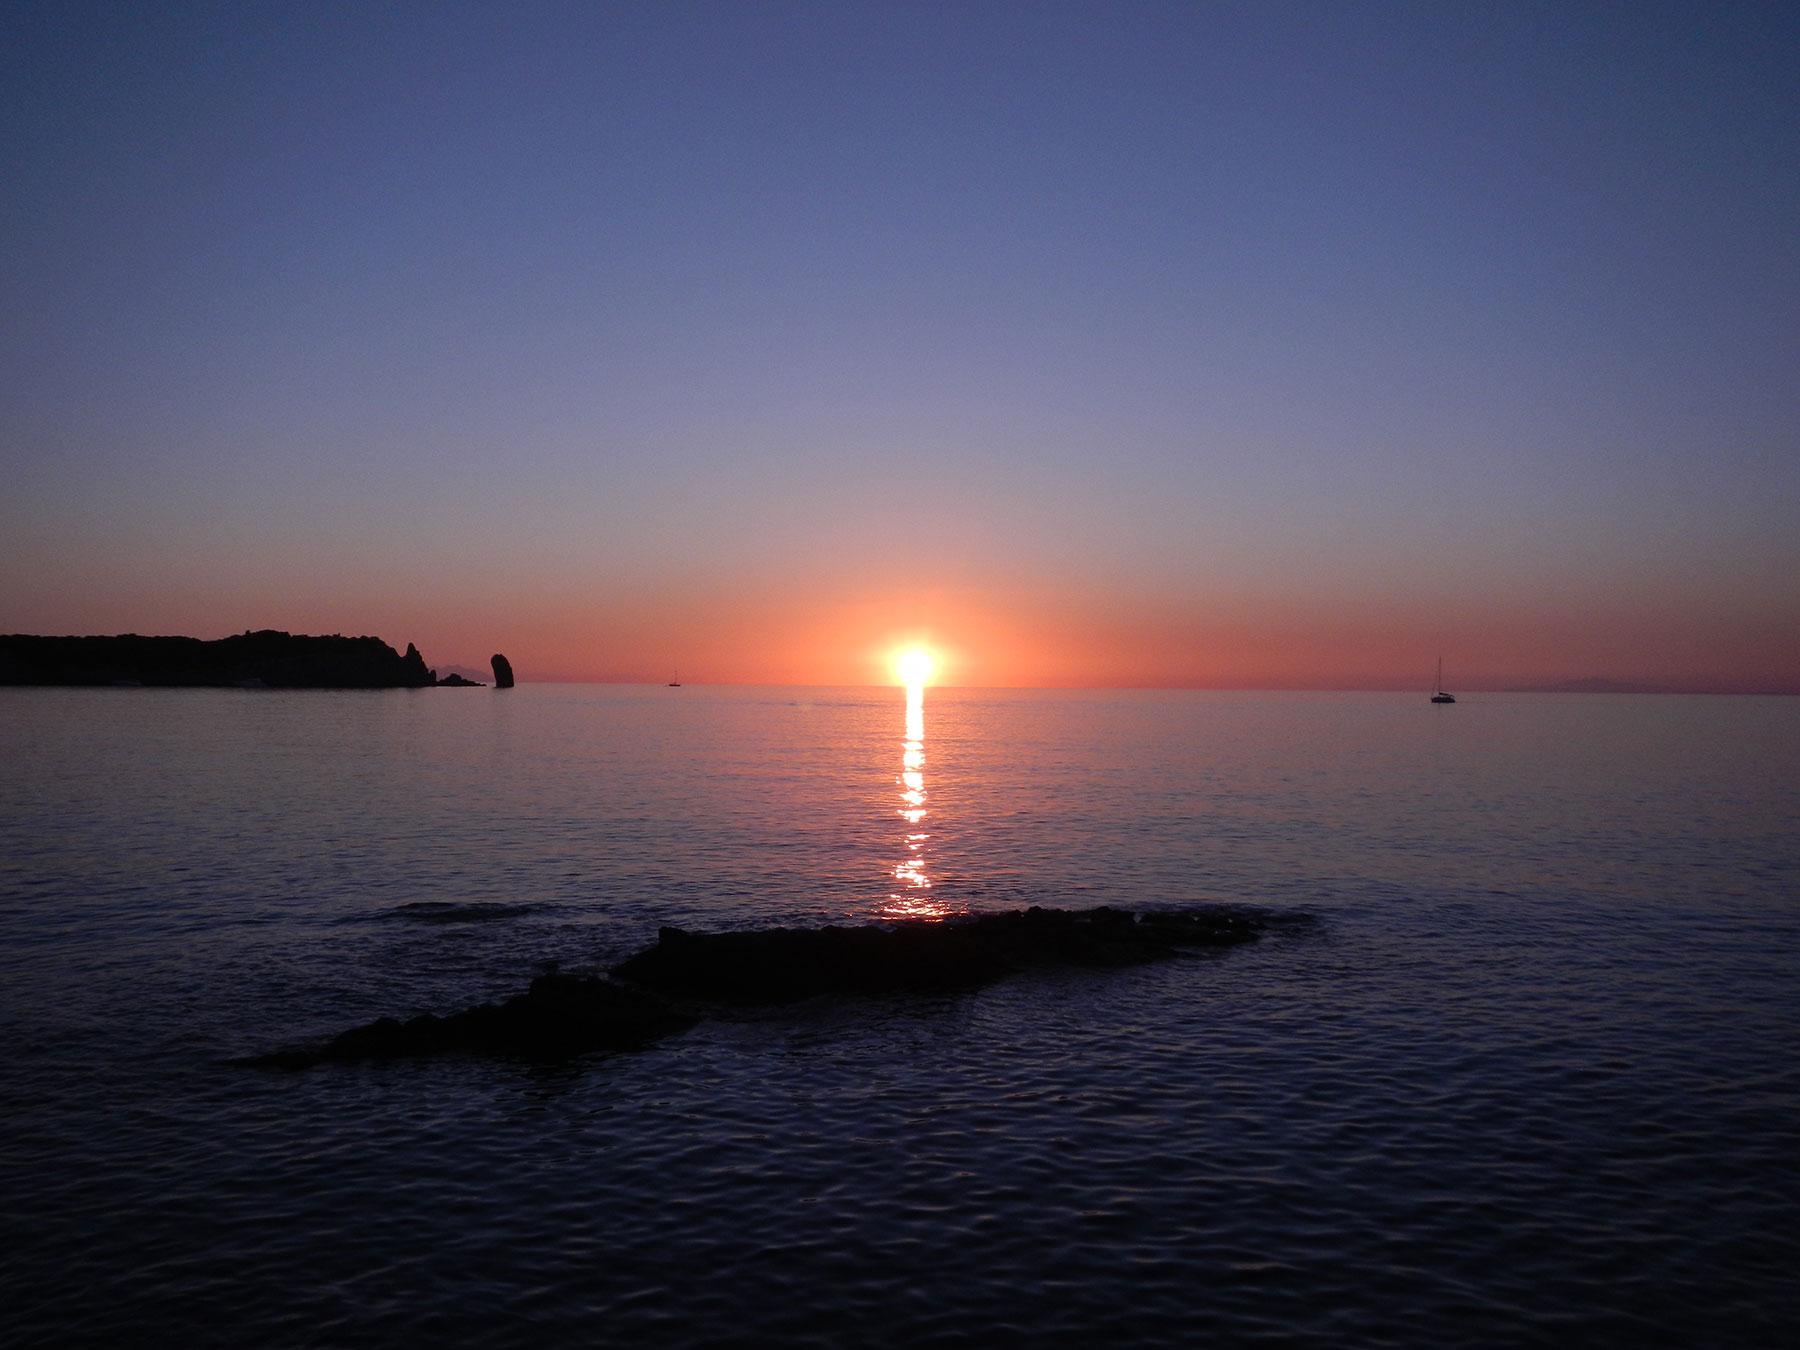 Noleggio Trimarano Isola del Giglio - Vela Giglio Campese - Isola del Giglio - Trimarano Giglio Porto - Tramonto Campese